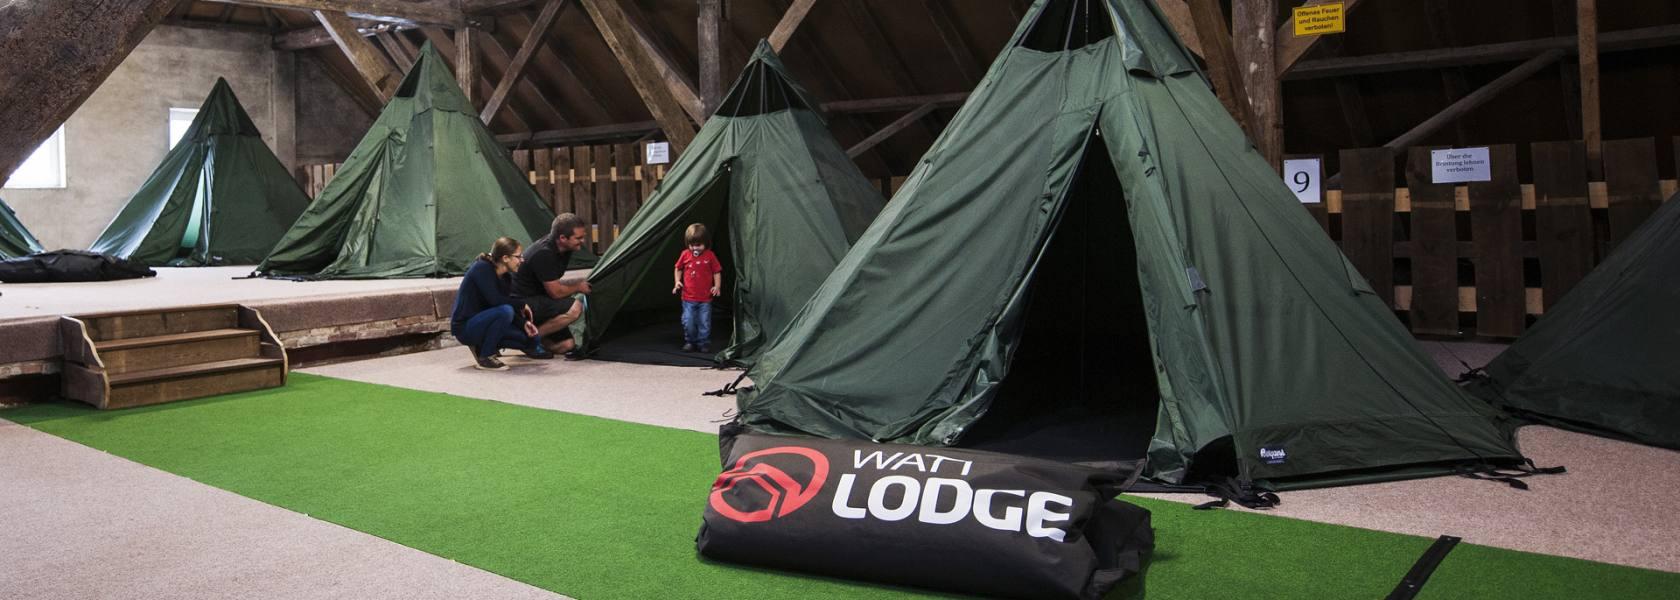 Tipi-Zelte in der Watt Lodge, © Florian Trykowski